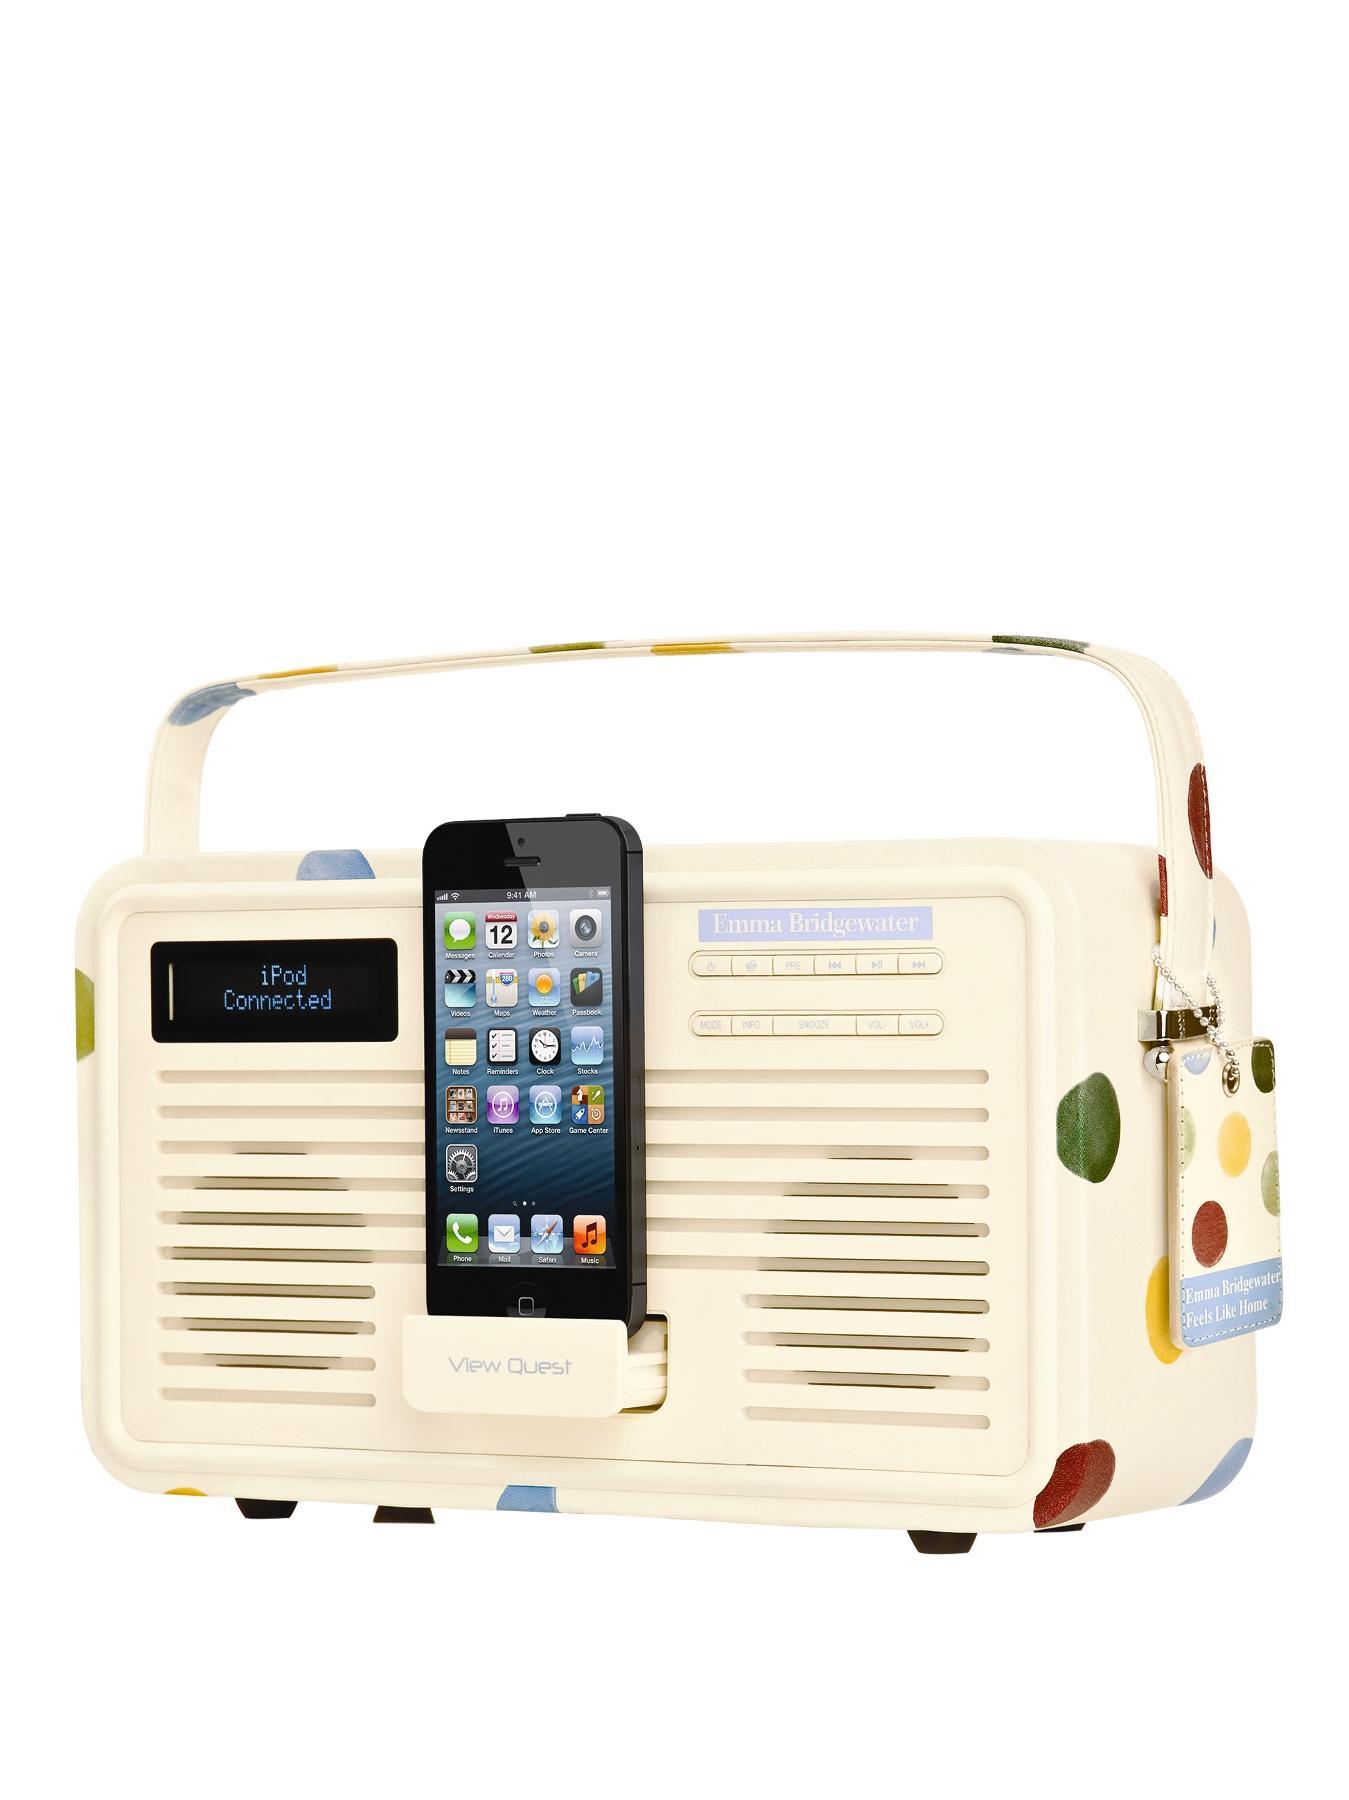 View Quest Emma Bridgewater Retro DAB Radio with Lightning Dock - Polka Dot